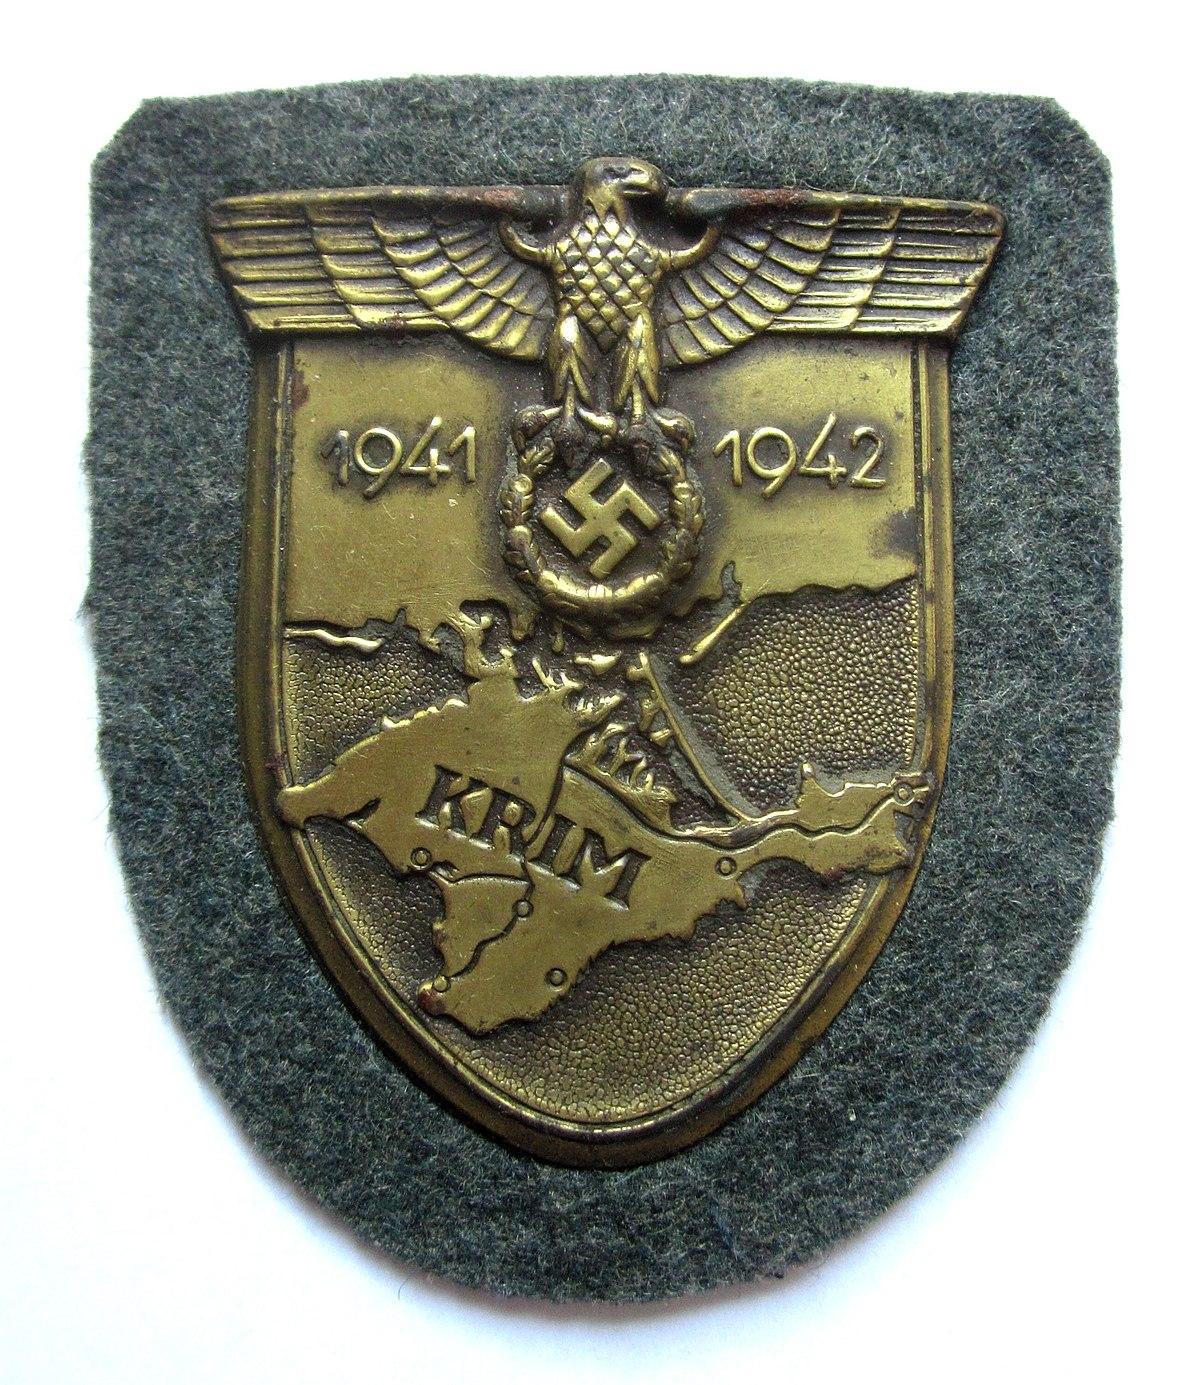 Crimea shield wikipedia - German military decorations ww2 ...